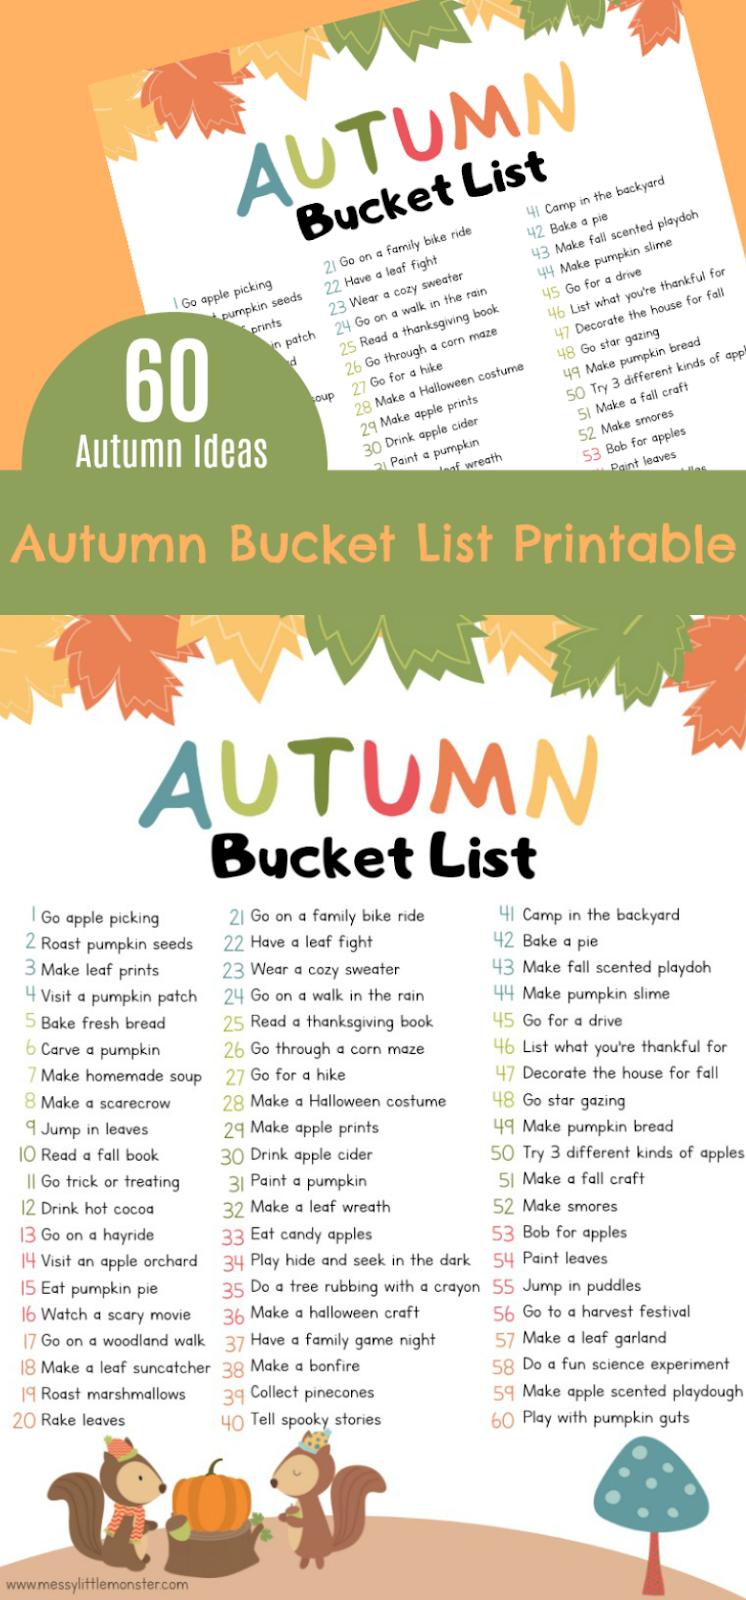 Free printable Autumn bucket list for kids.